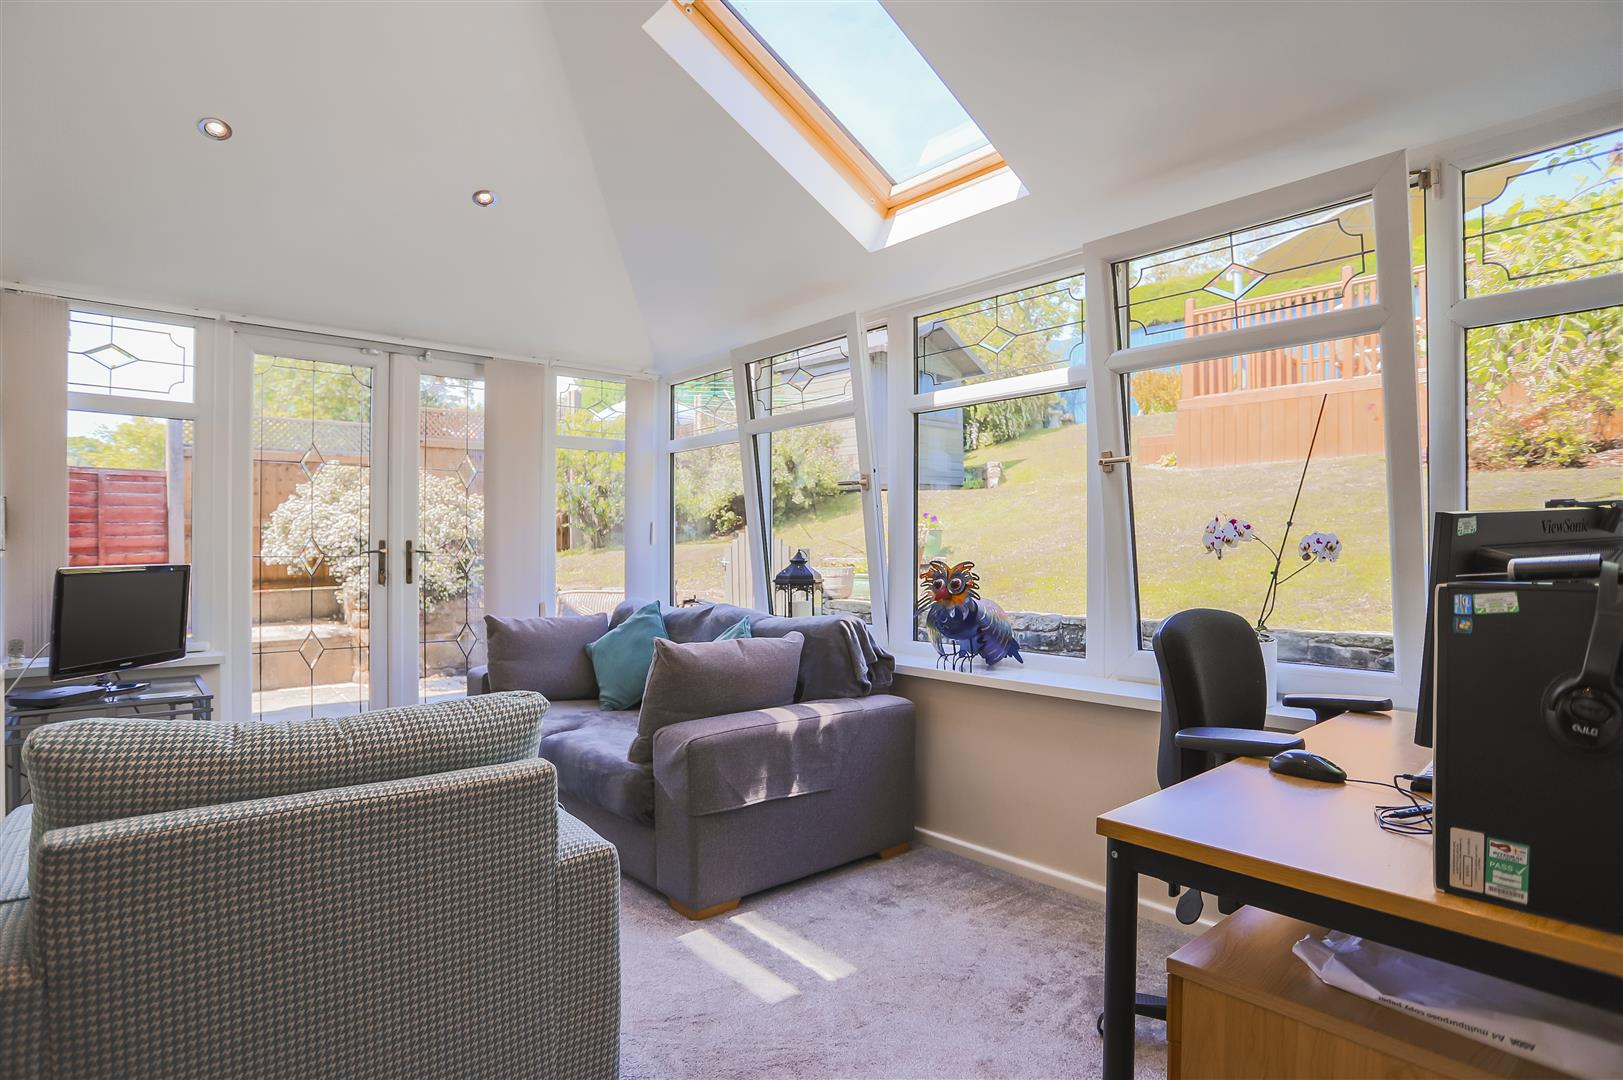 4 Bedroom Semi-detached House For Sale - Image 14